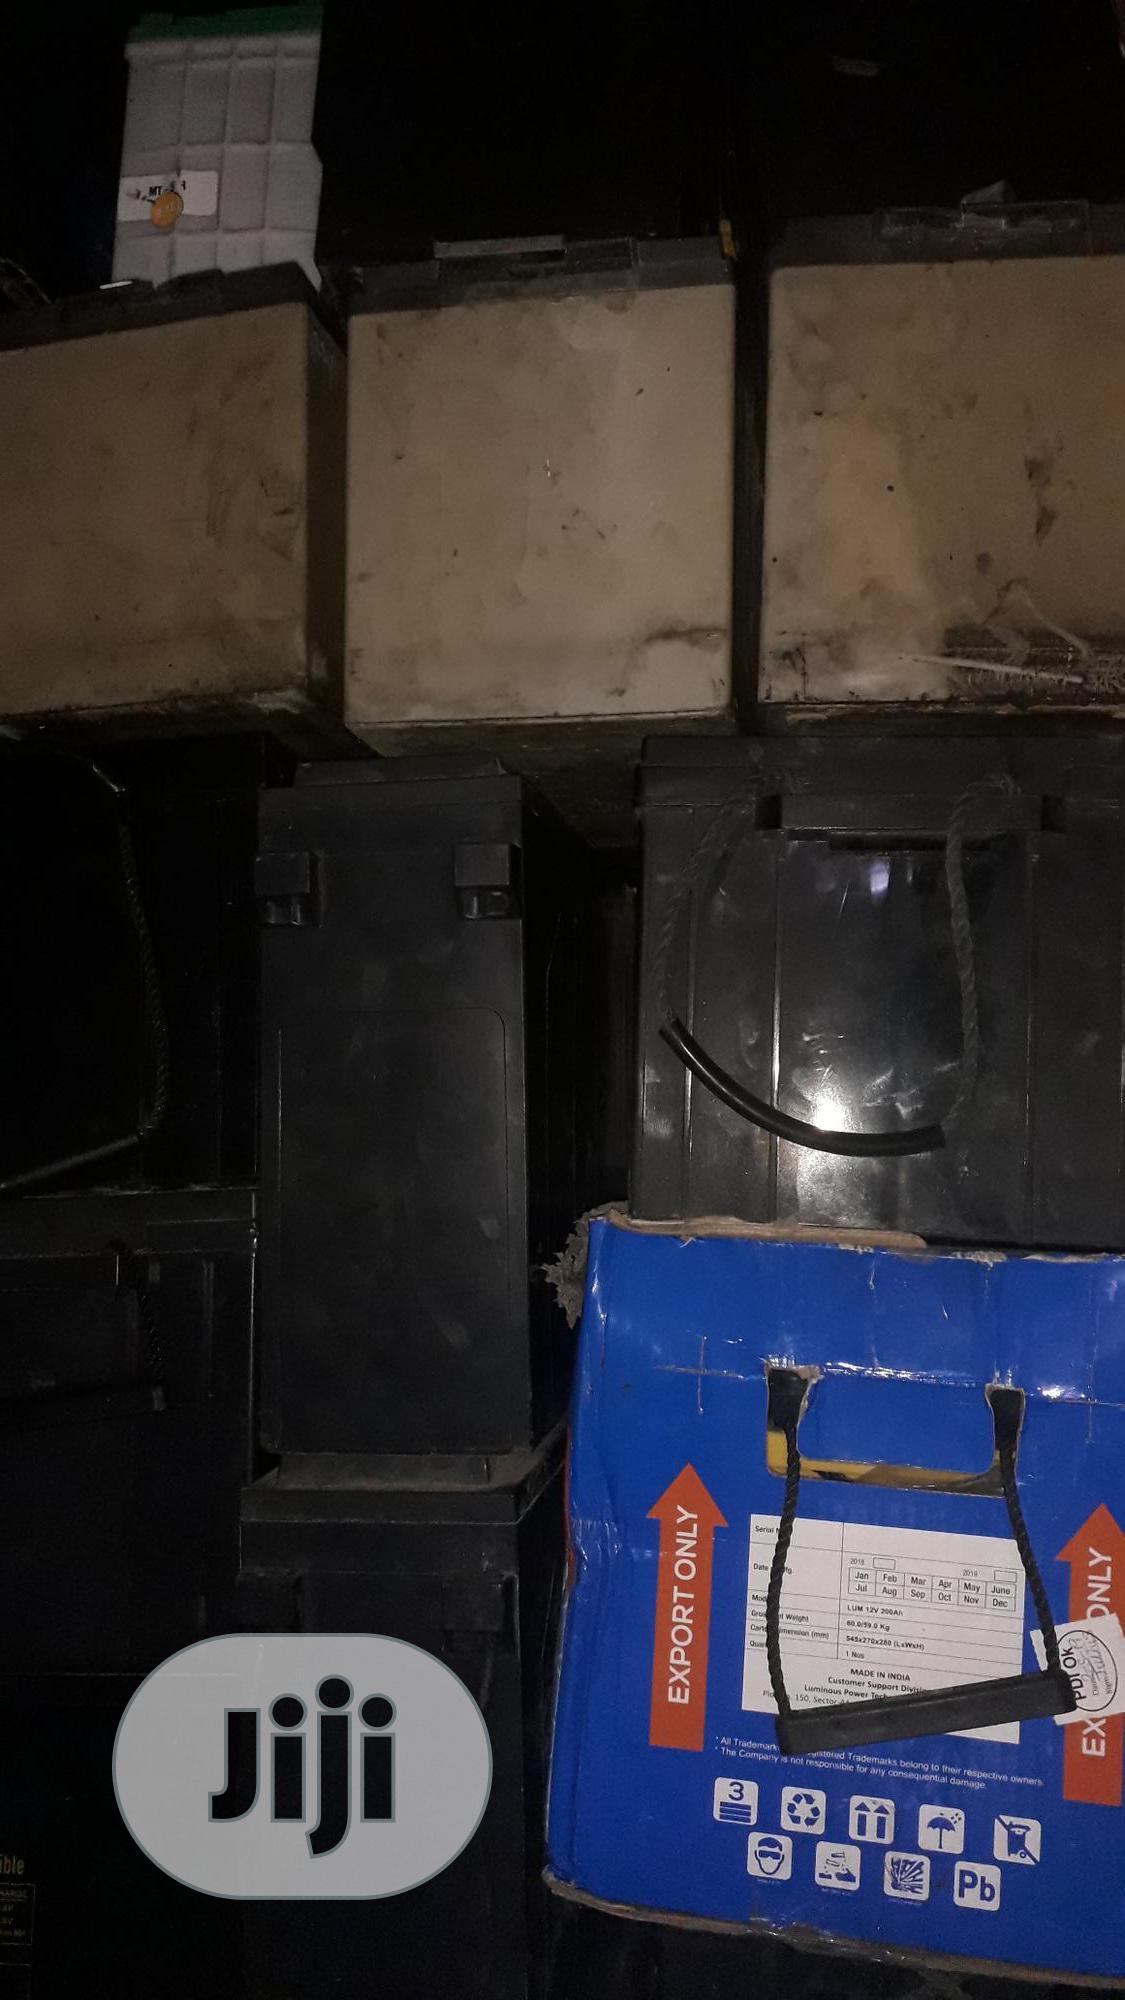 We Buy Scrap (Condemn) Inverter Batteries Lagos   Electrical Equipment for sale in Shomolu, Lagos State, Nigeria